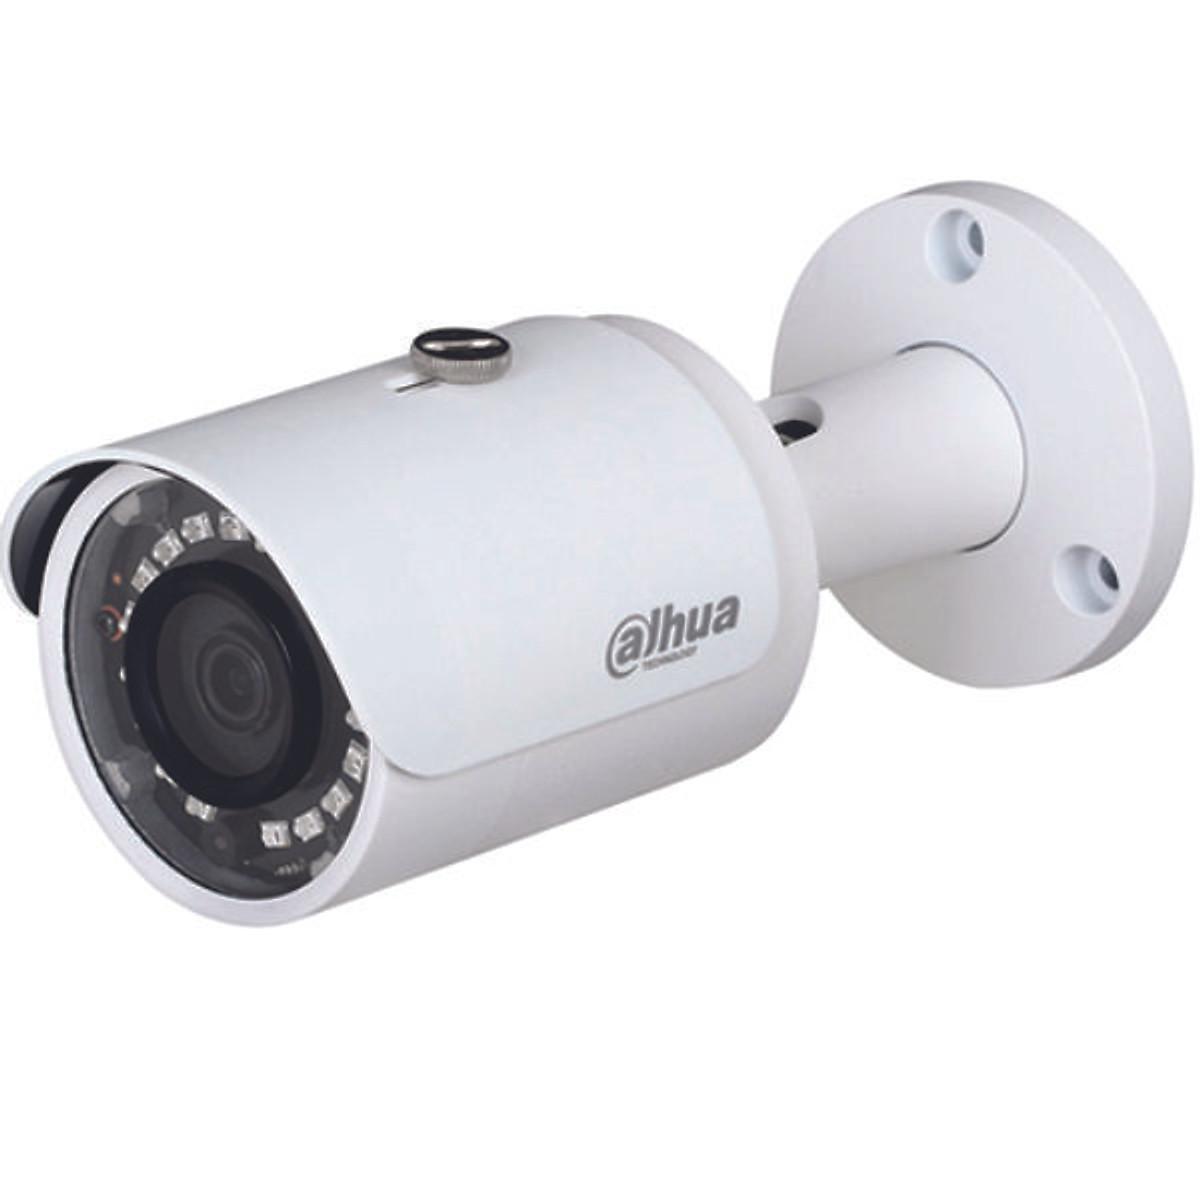 Camera Quan Sát CVI Dahua HAC-HFW1200SP-S4 – Hàng Chính Hãng